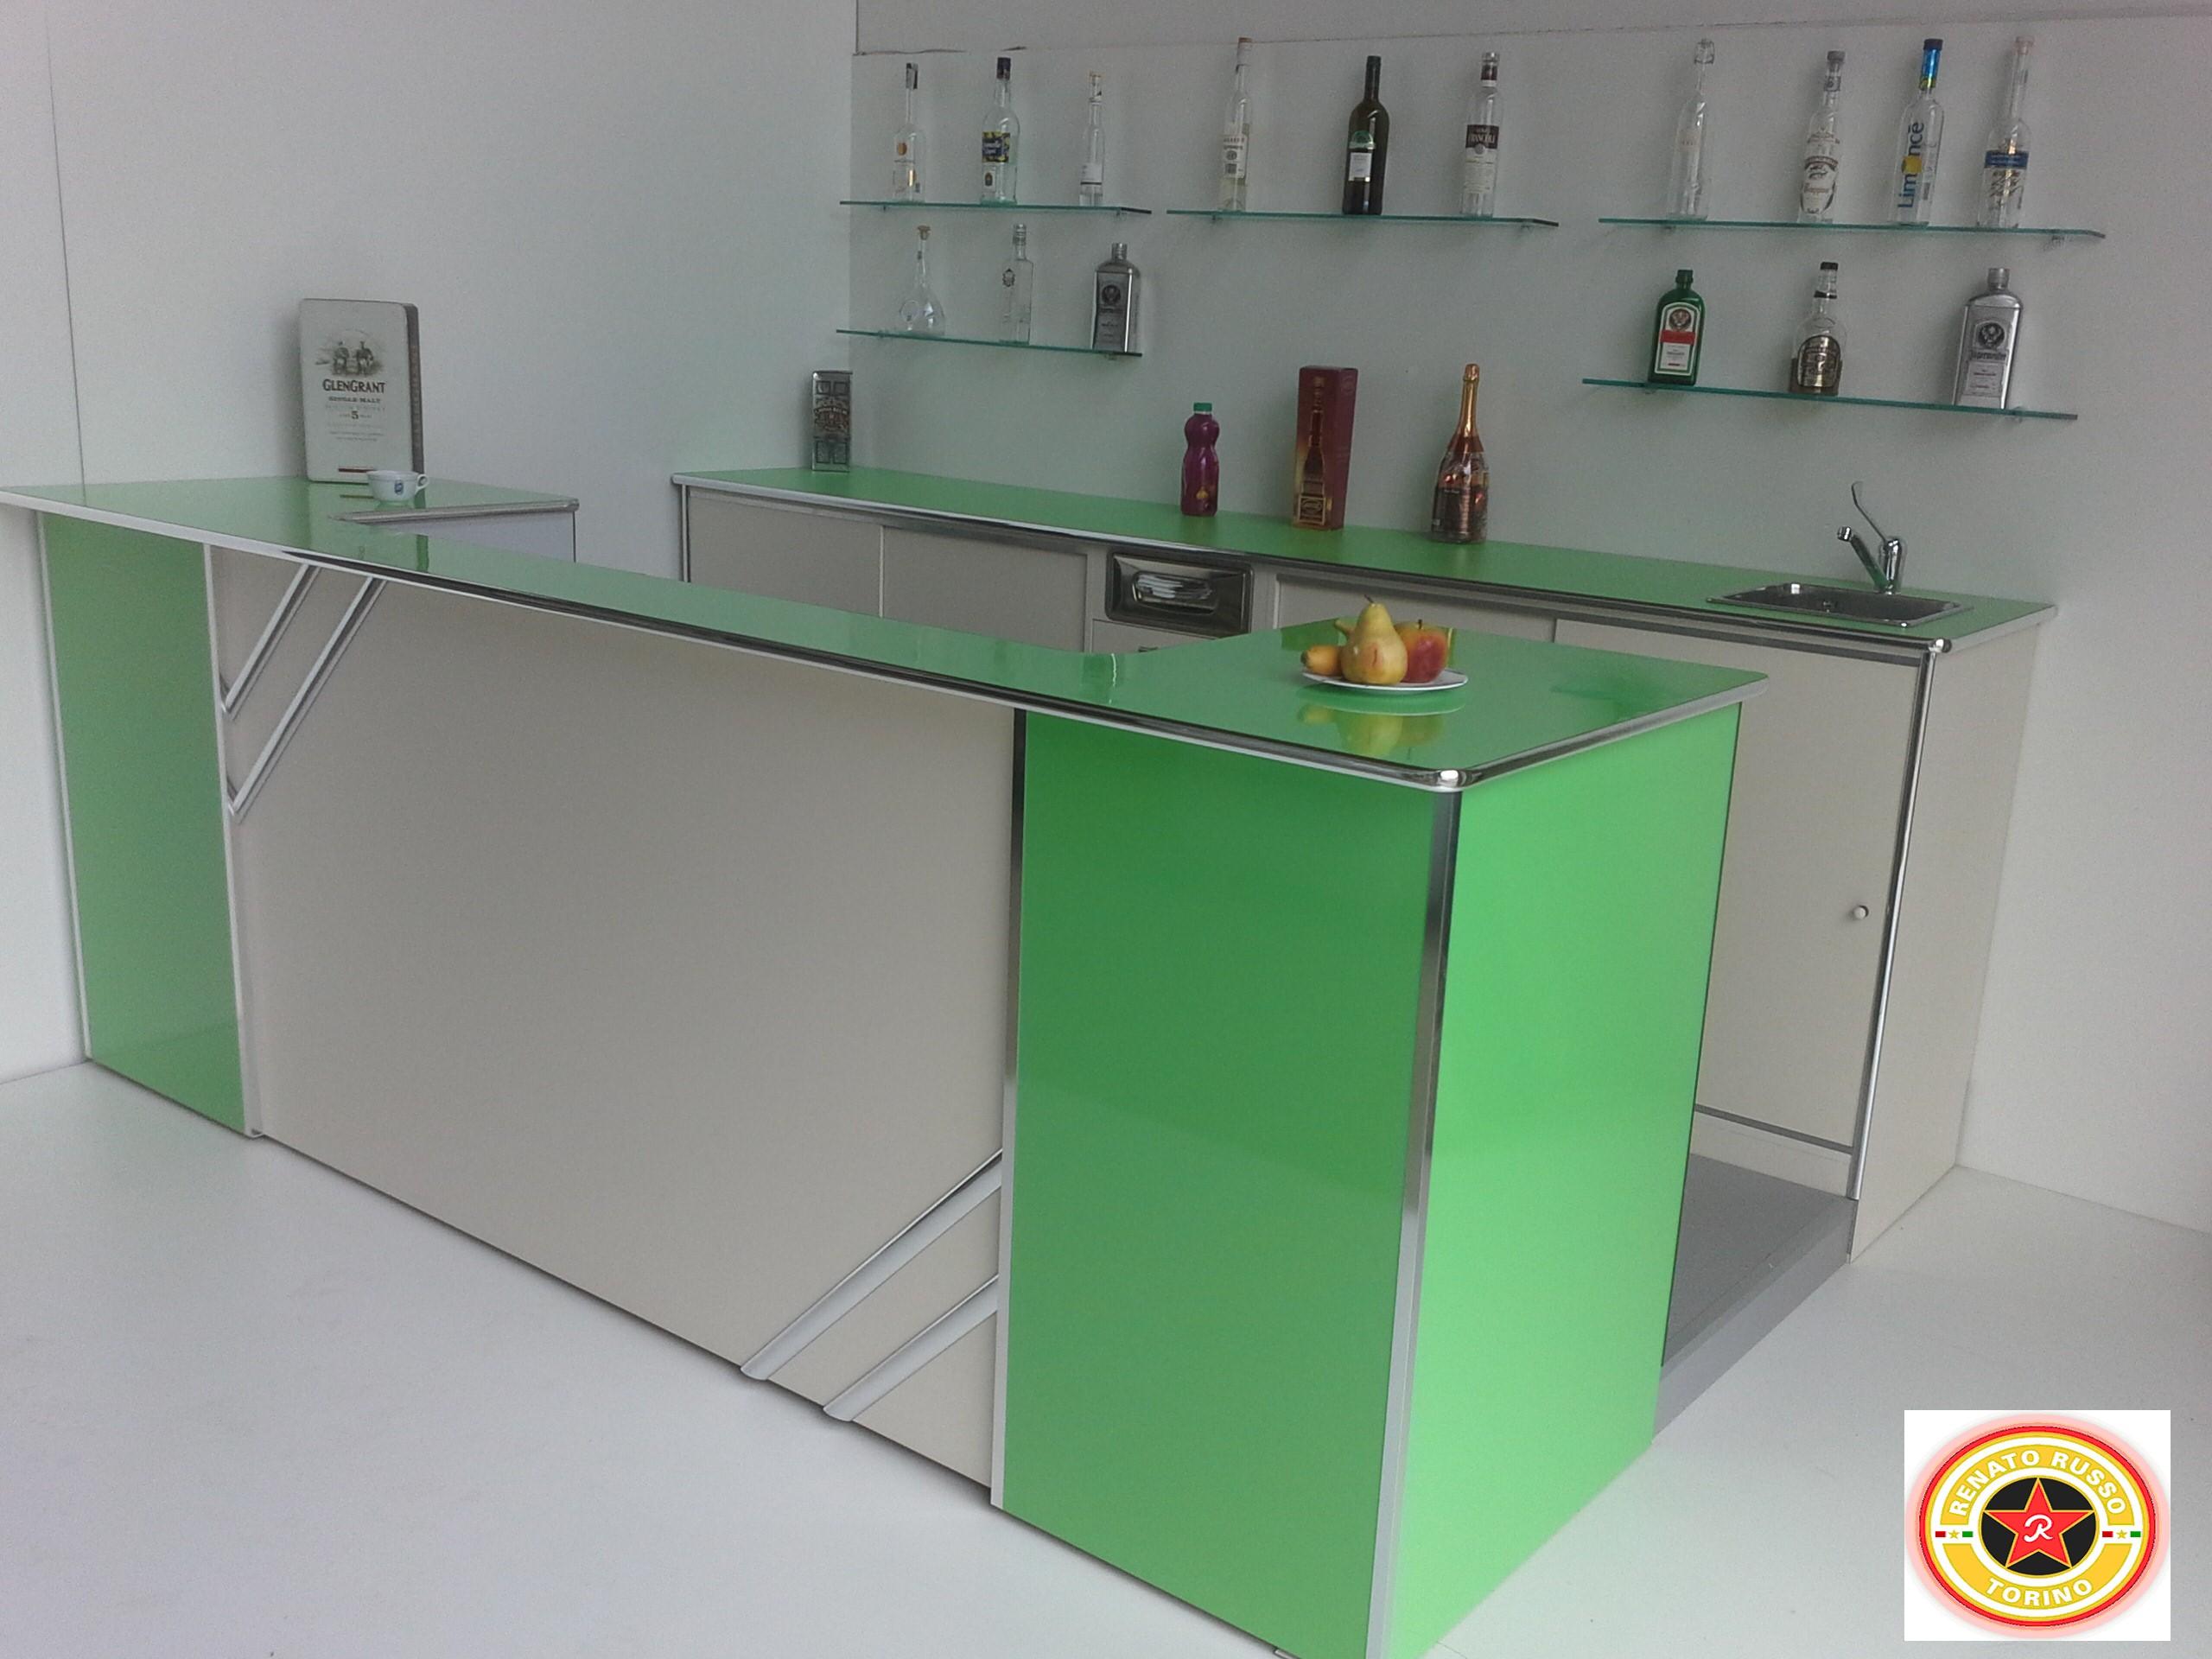 Arredi per bar arredamenti per negozi arredi commerciali for Arredi bar usati